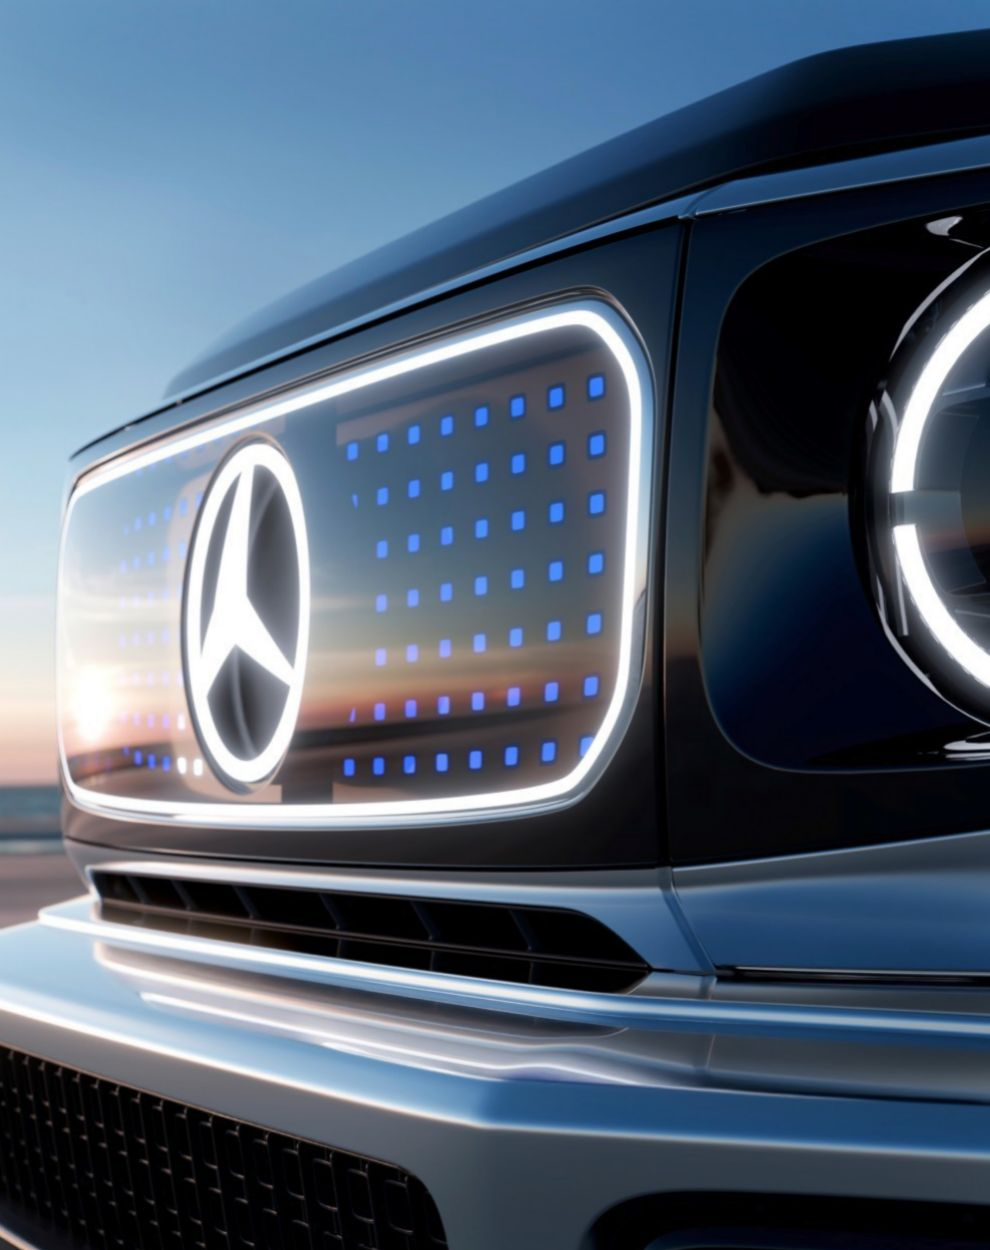 Mercedes-Benz EQG Concept - Clase G electrico - 4x4 - Salon de Munich - IAA 2021